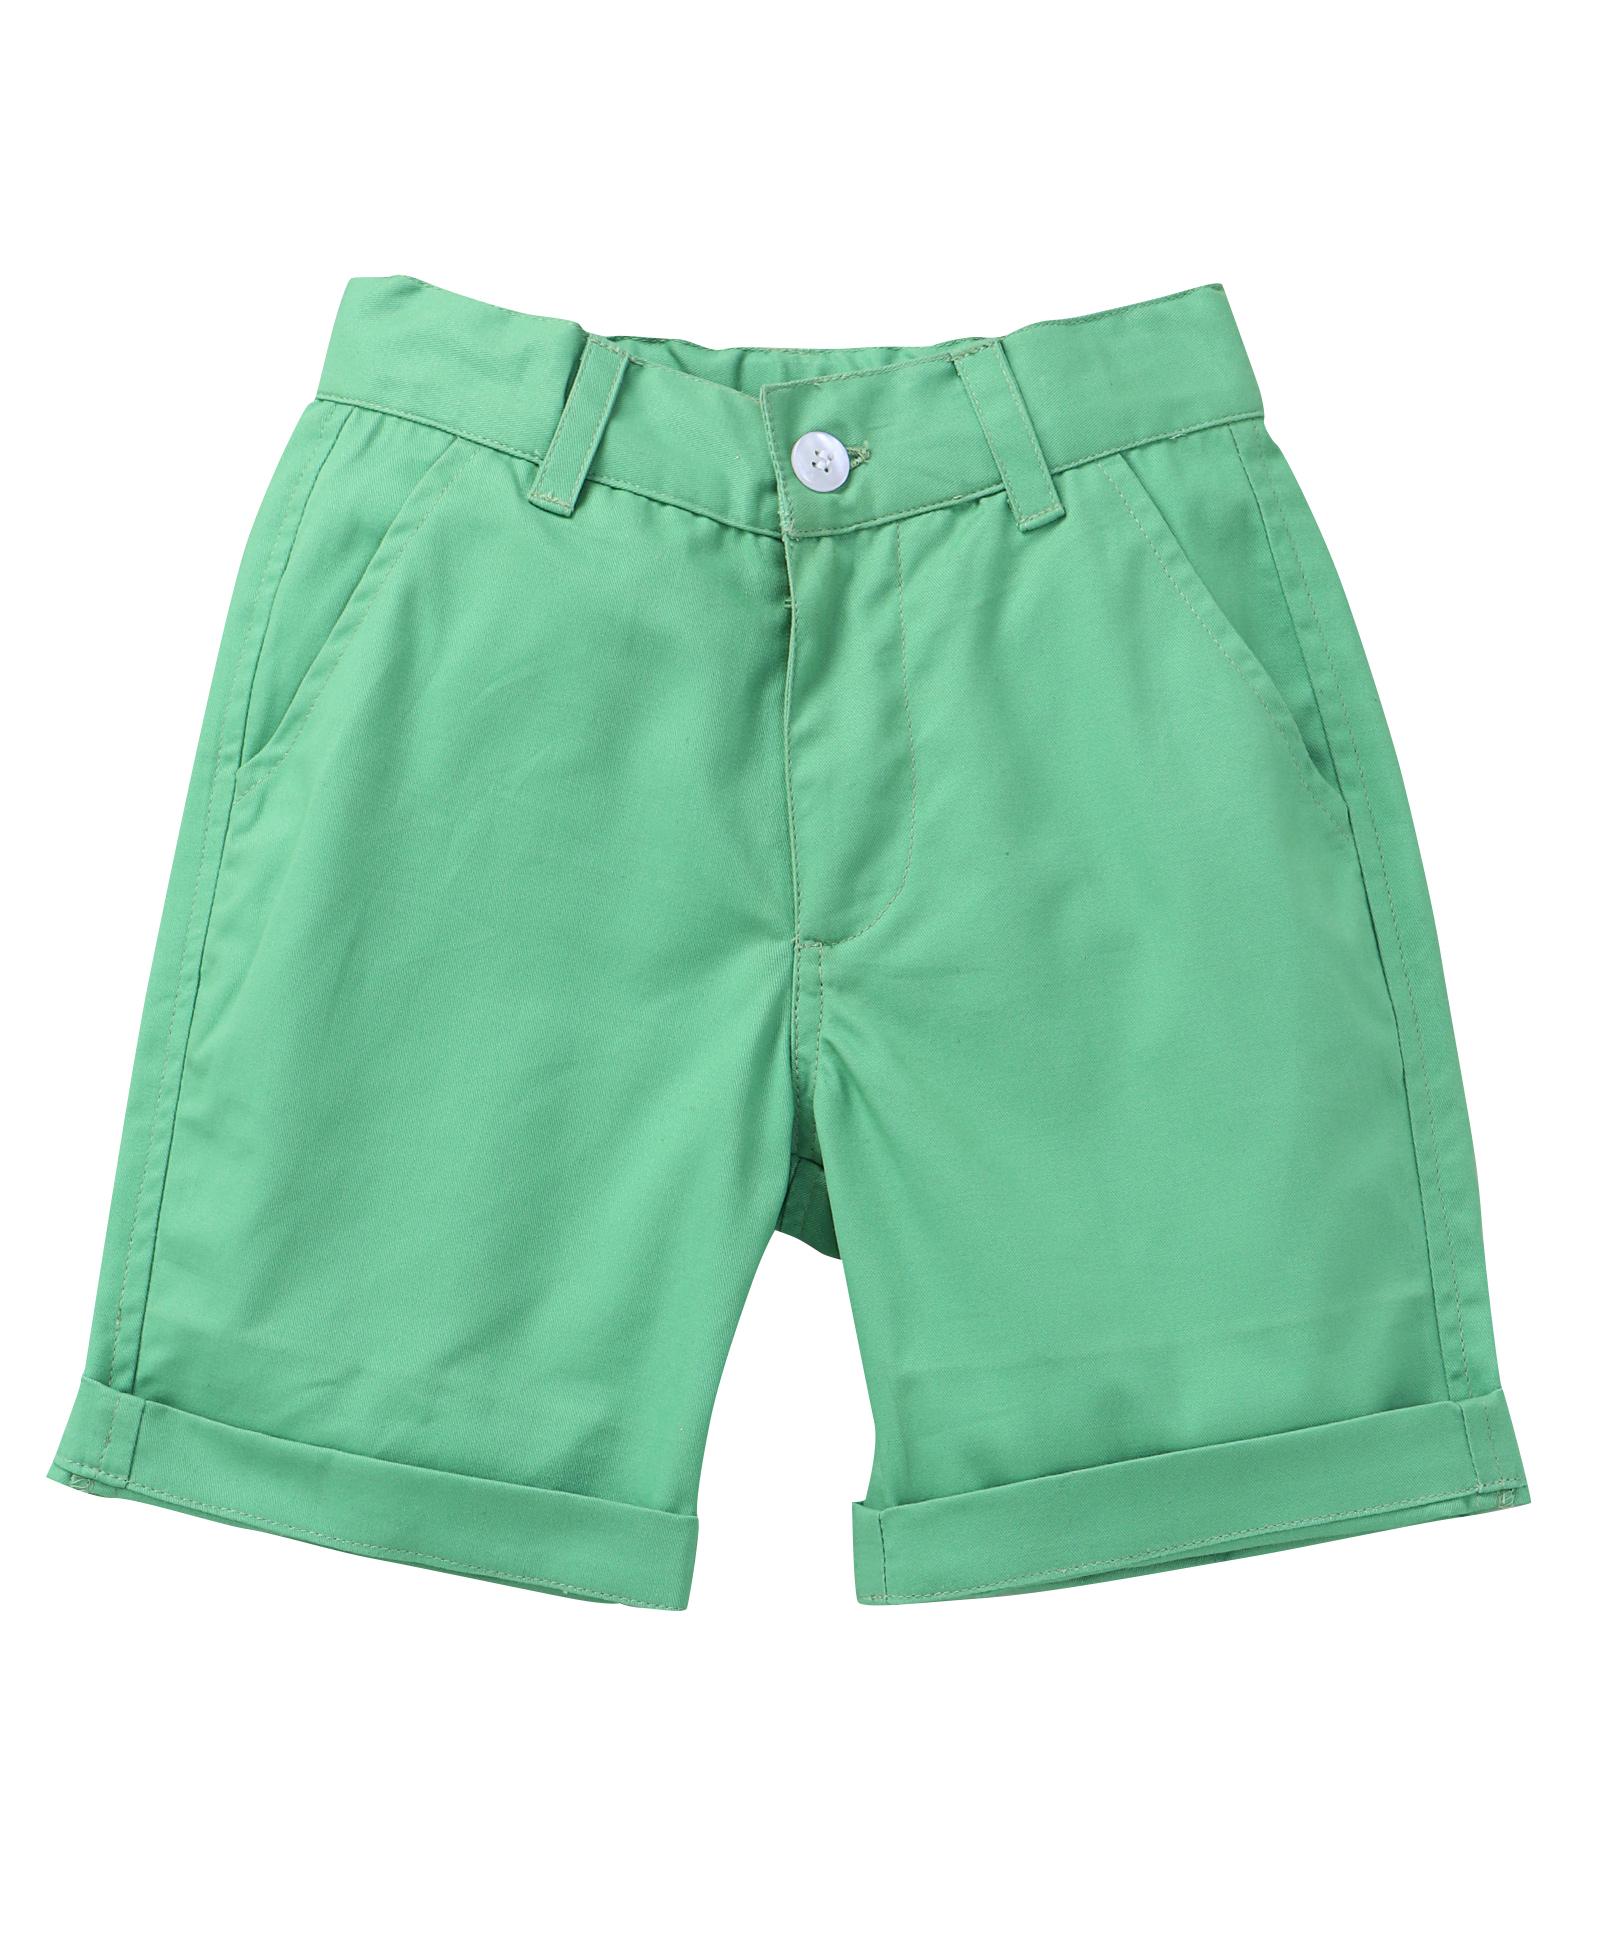 Popsicles Clothing   Popsicles Shamrock Shorts Regular Fit For Boys